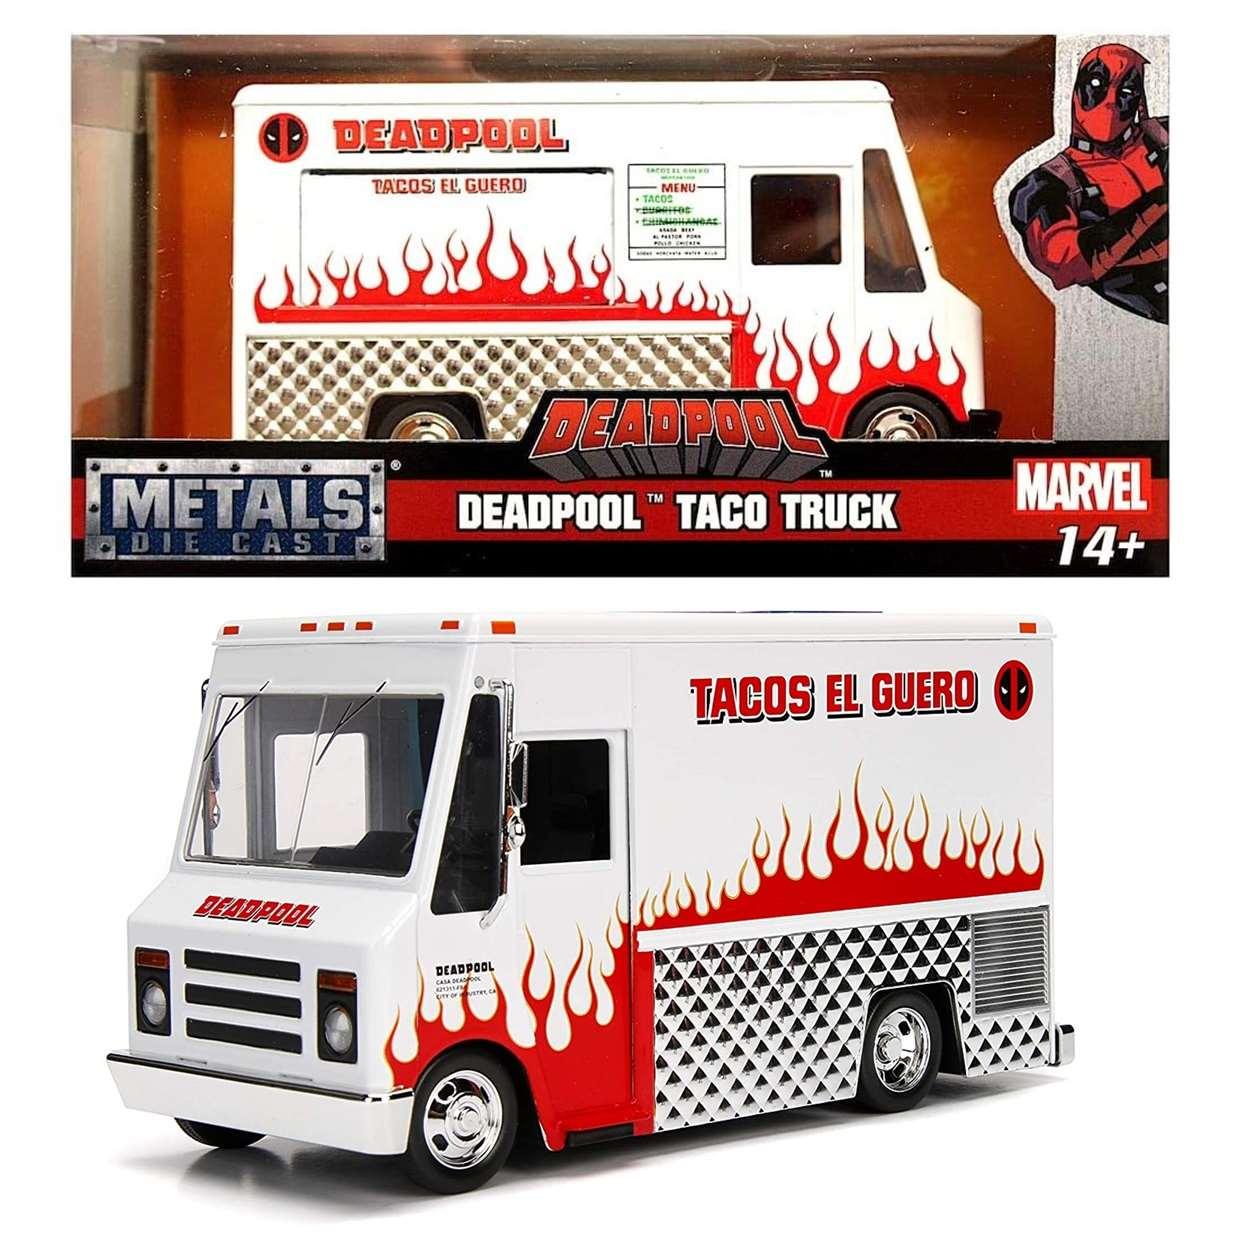 Deadpool Taco Truck White Marvel Metal Die Cast Jada Toys